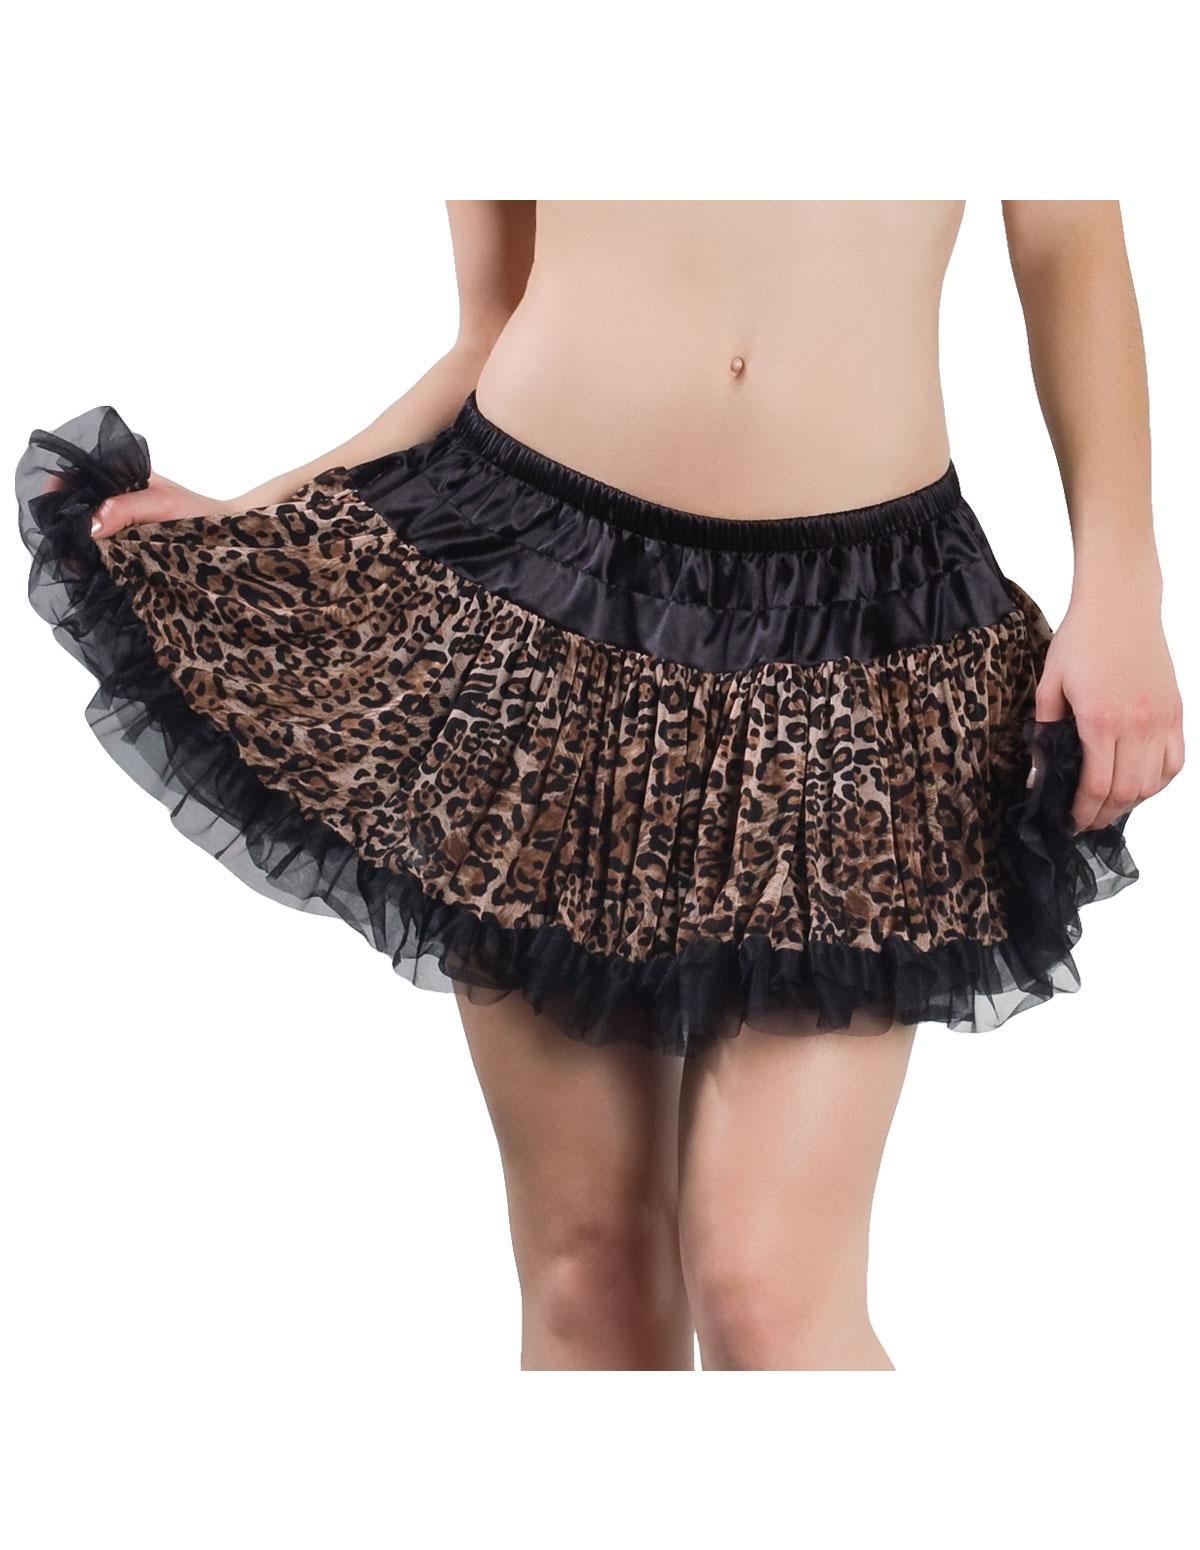 Leopard Petticoat